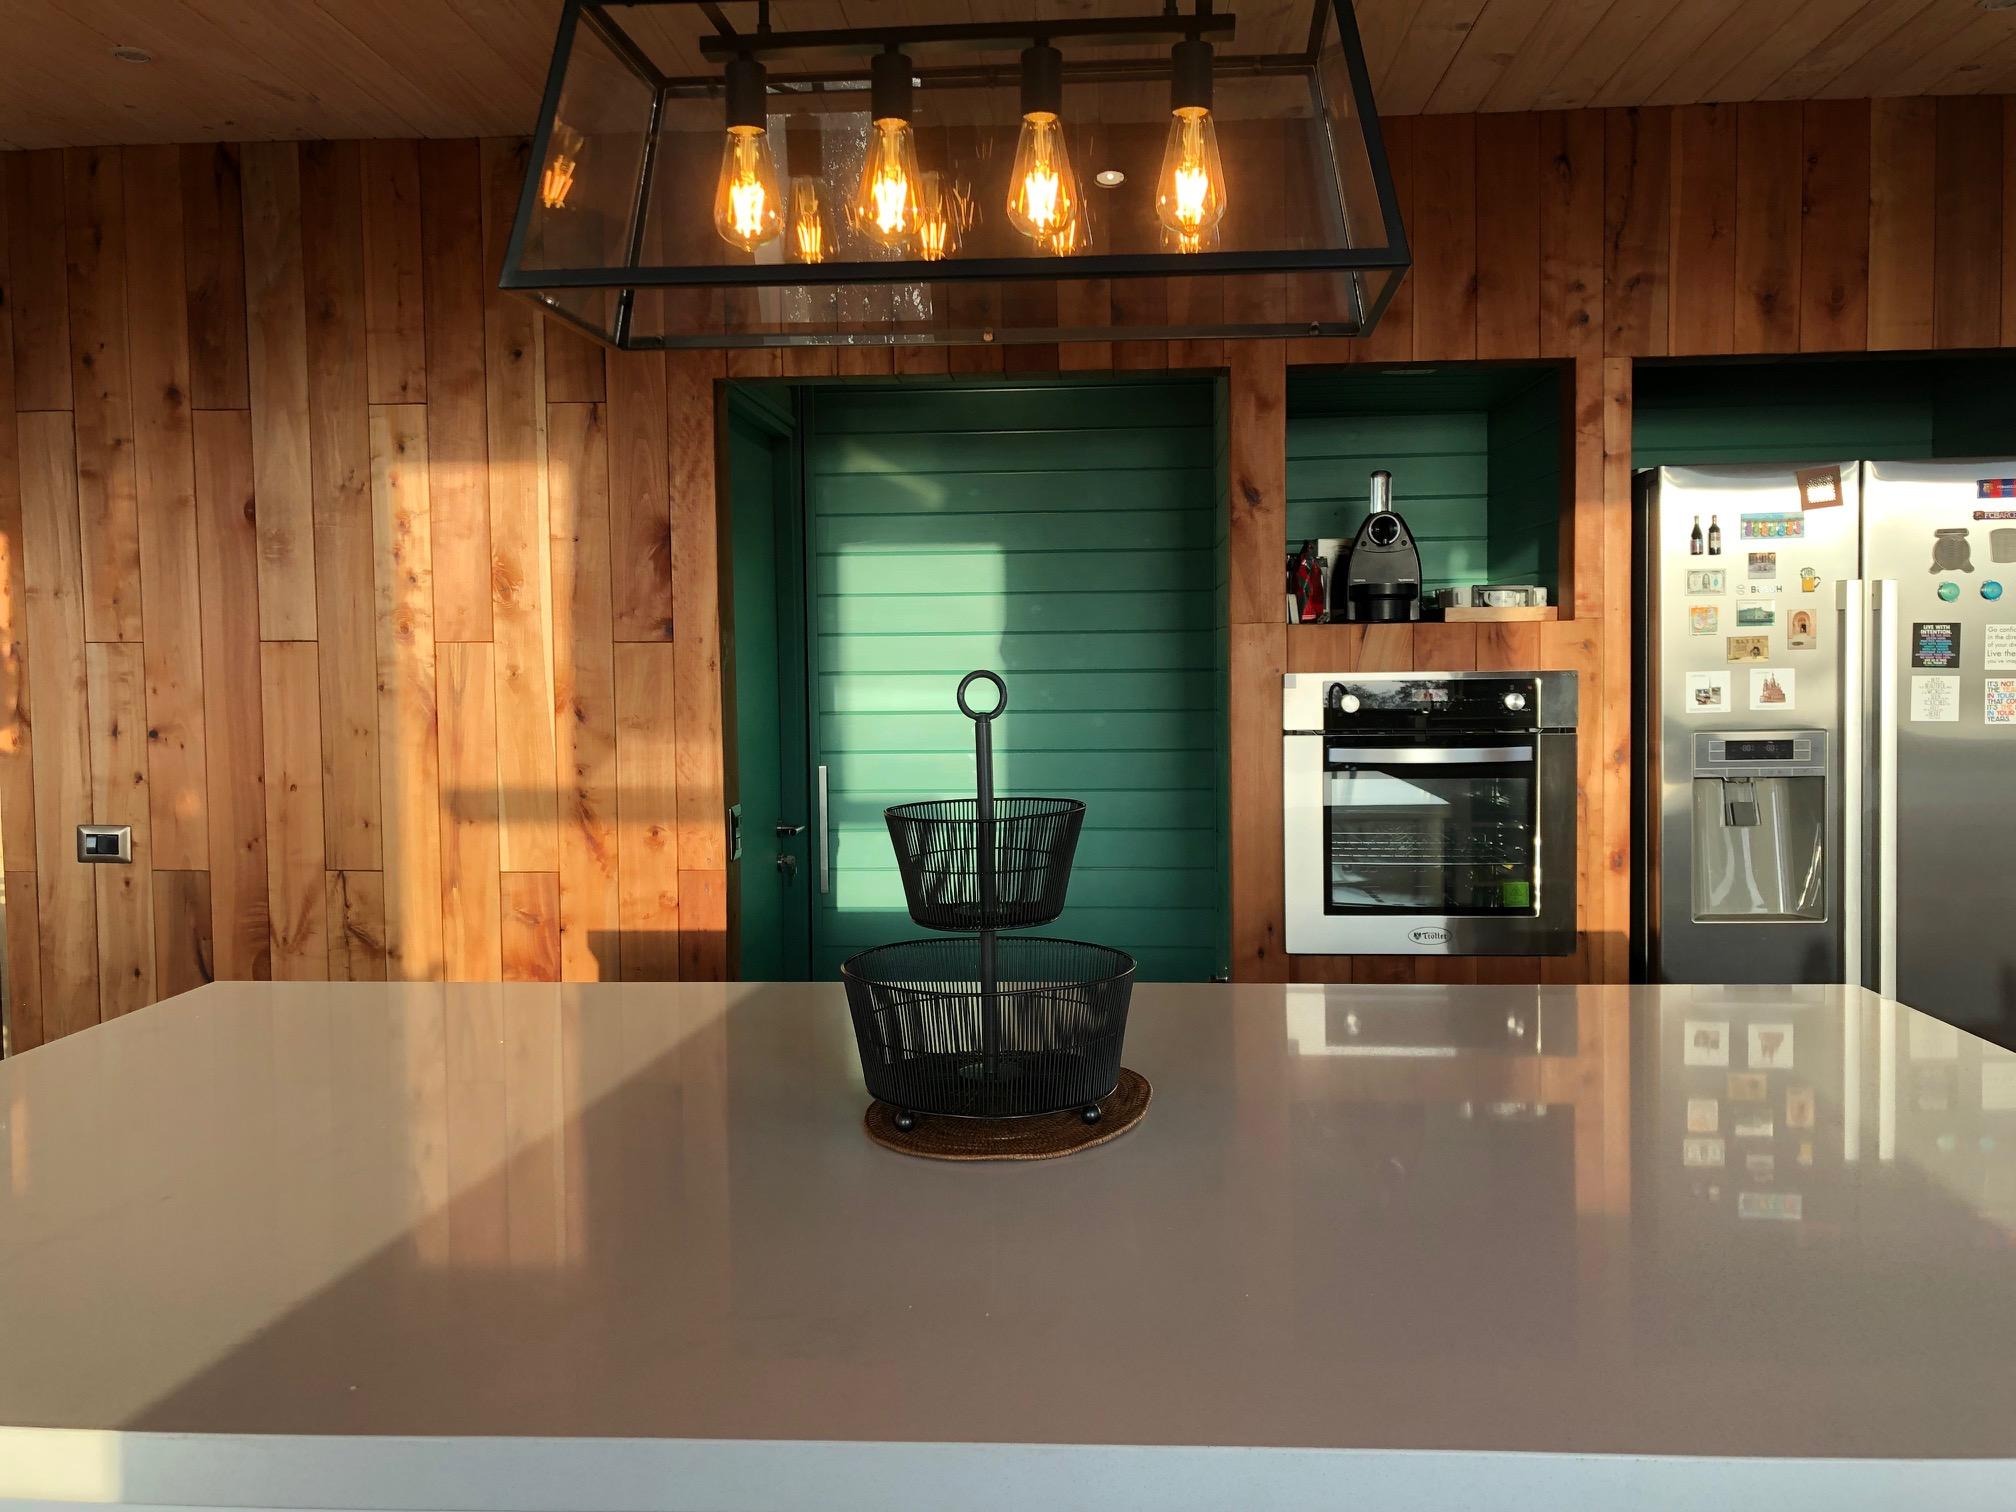 PC21 detalle meson isla cocina